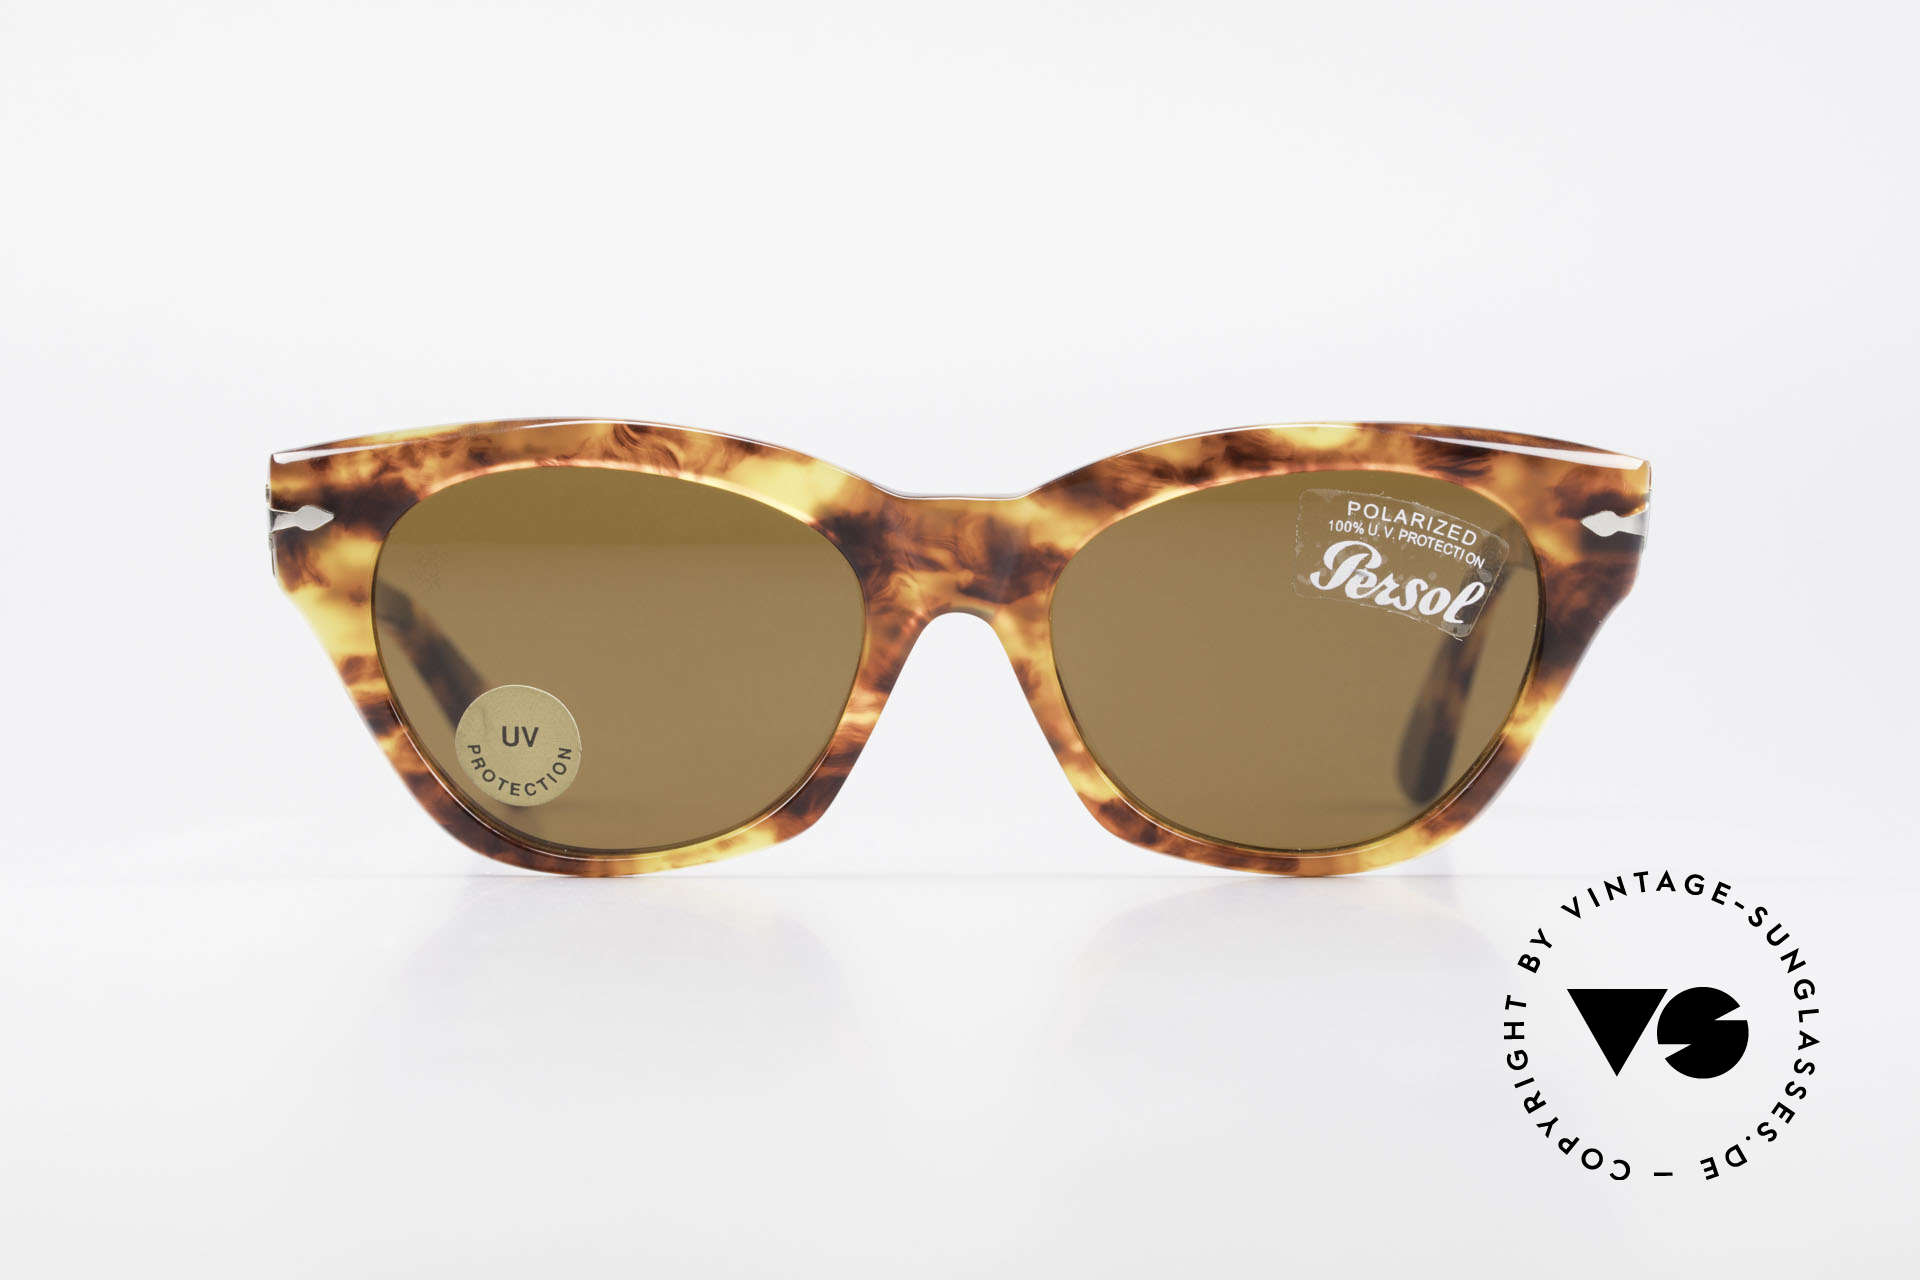 Persol 842 Ratti Classic Ladies Sunglasses, classic timeless design & best craftsmanship, Made for Women